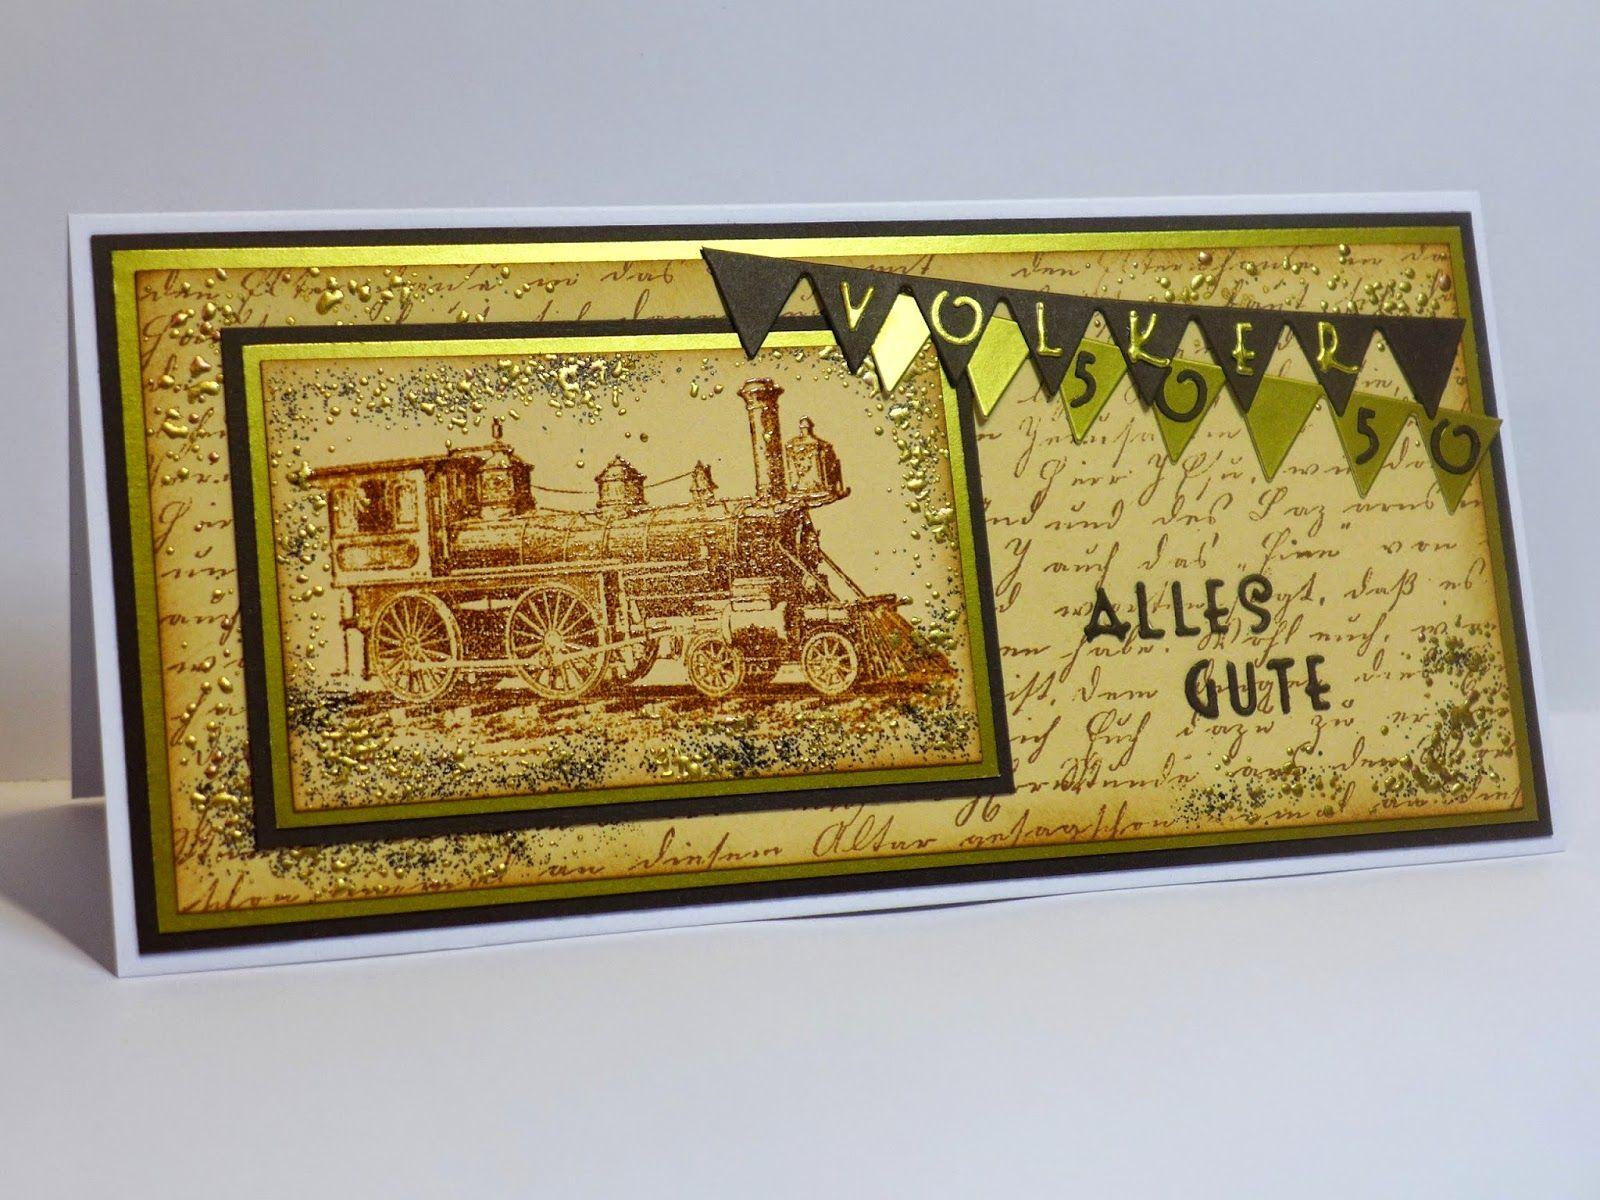 Simones Karten-Ecke: Männergeburtstagskarte - Male birthday card - handstamped and embossed